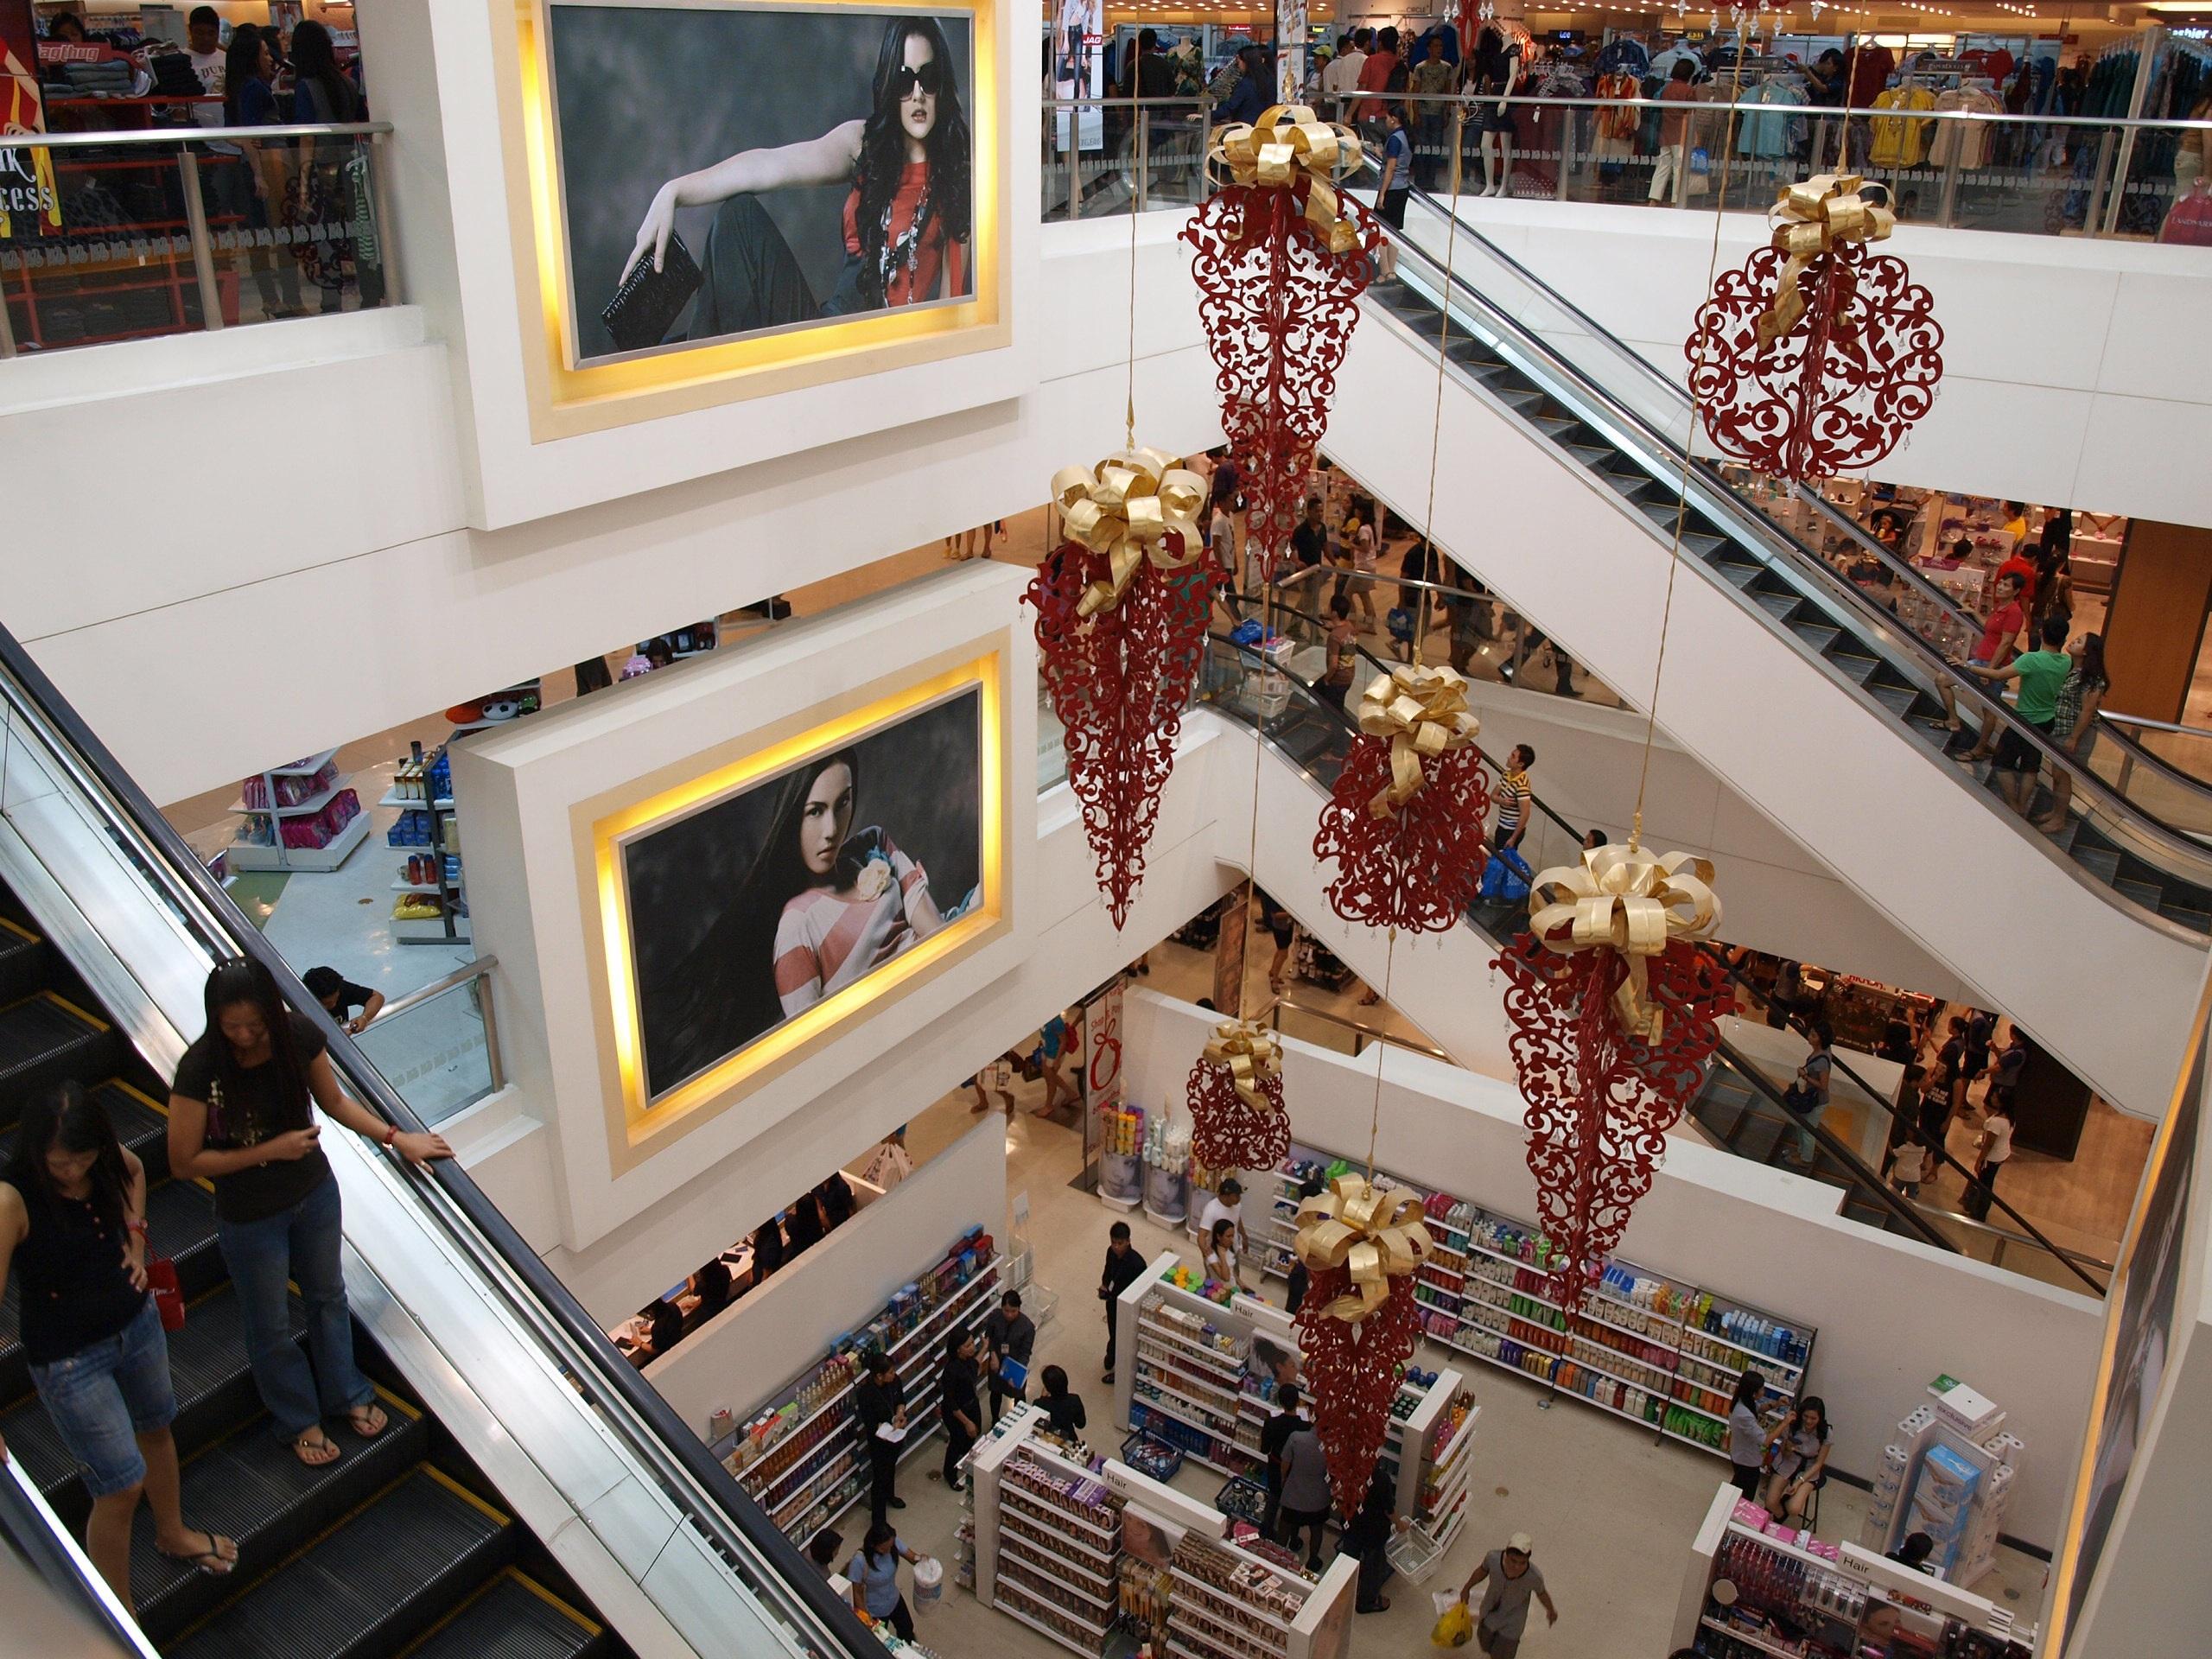 Home shop store shopping toy interior design art design elevator mall tourist attraction sale consumerism retail